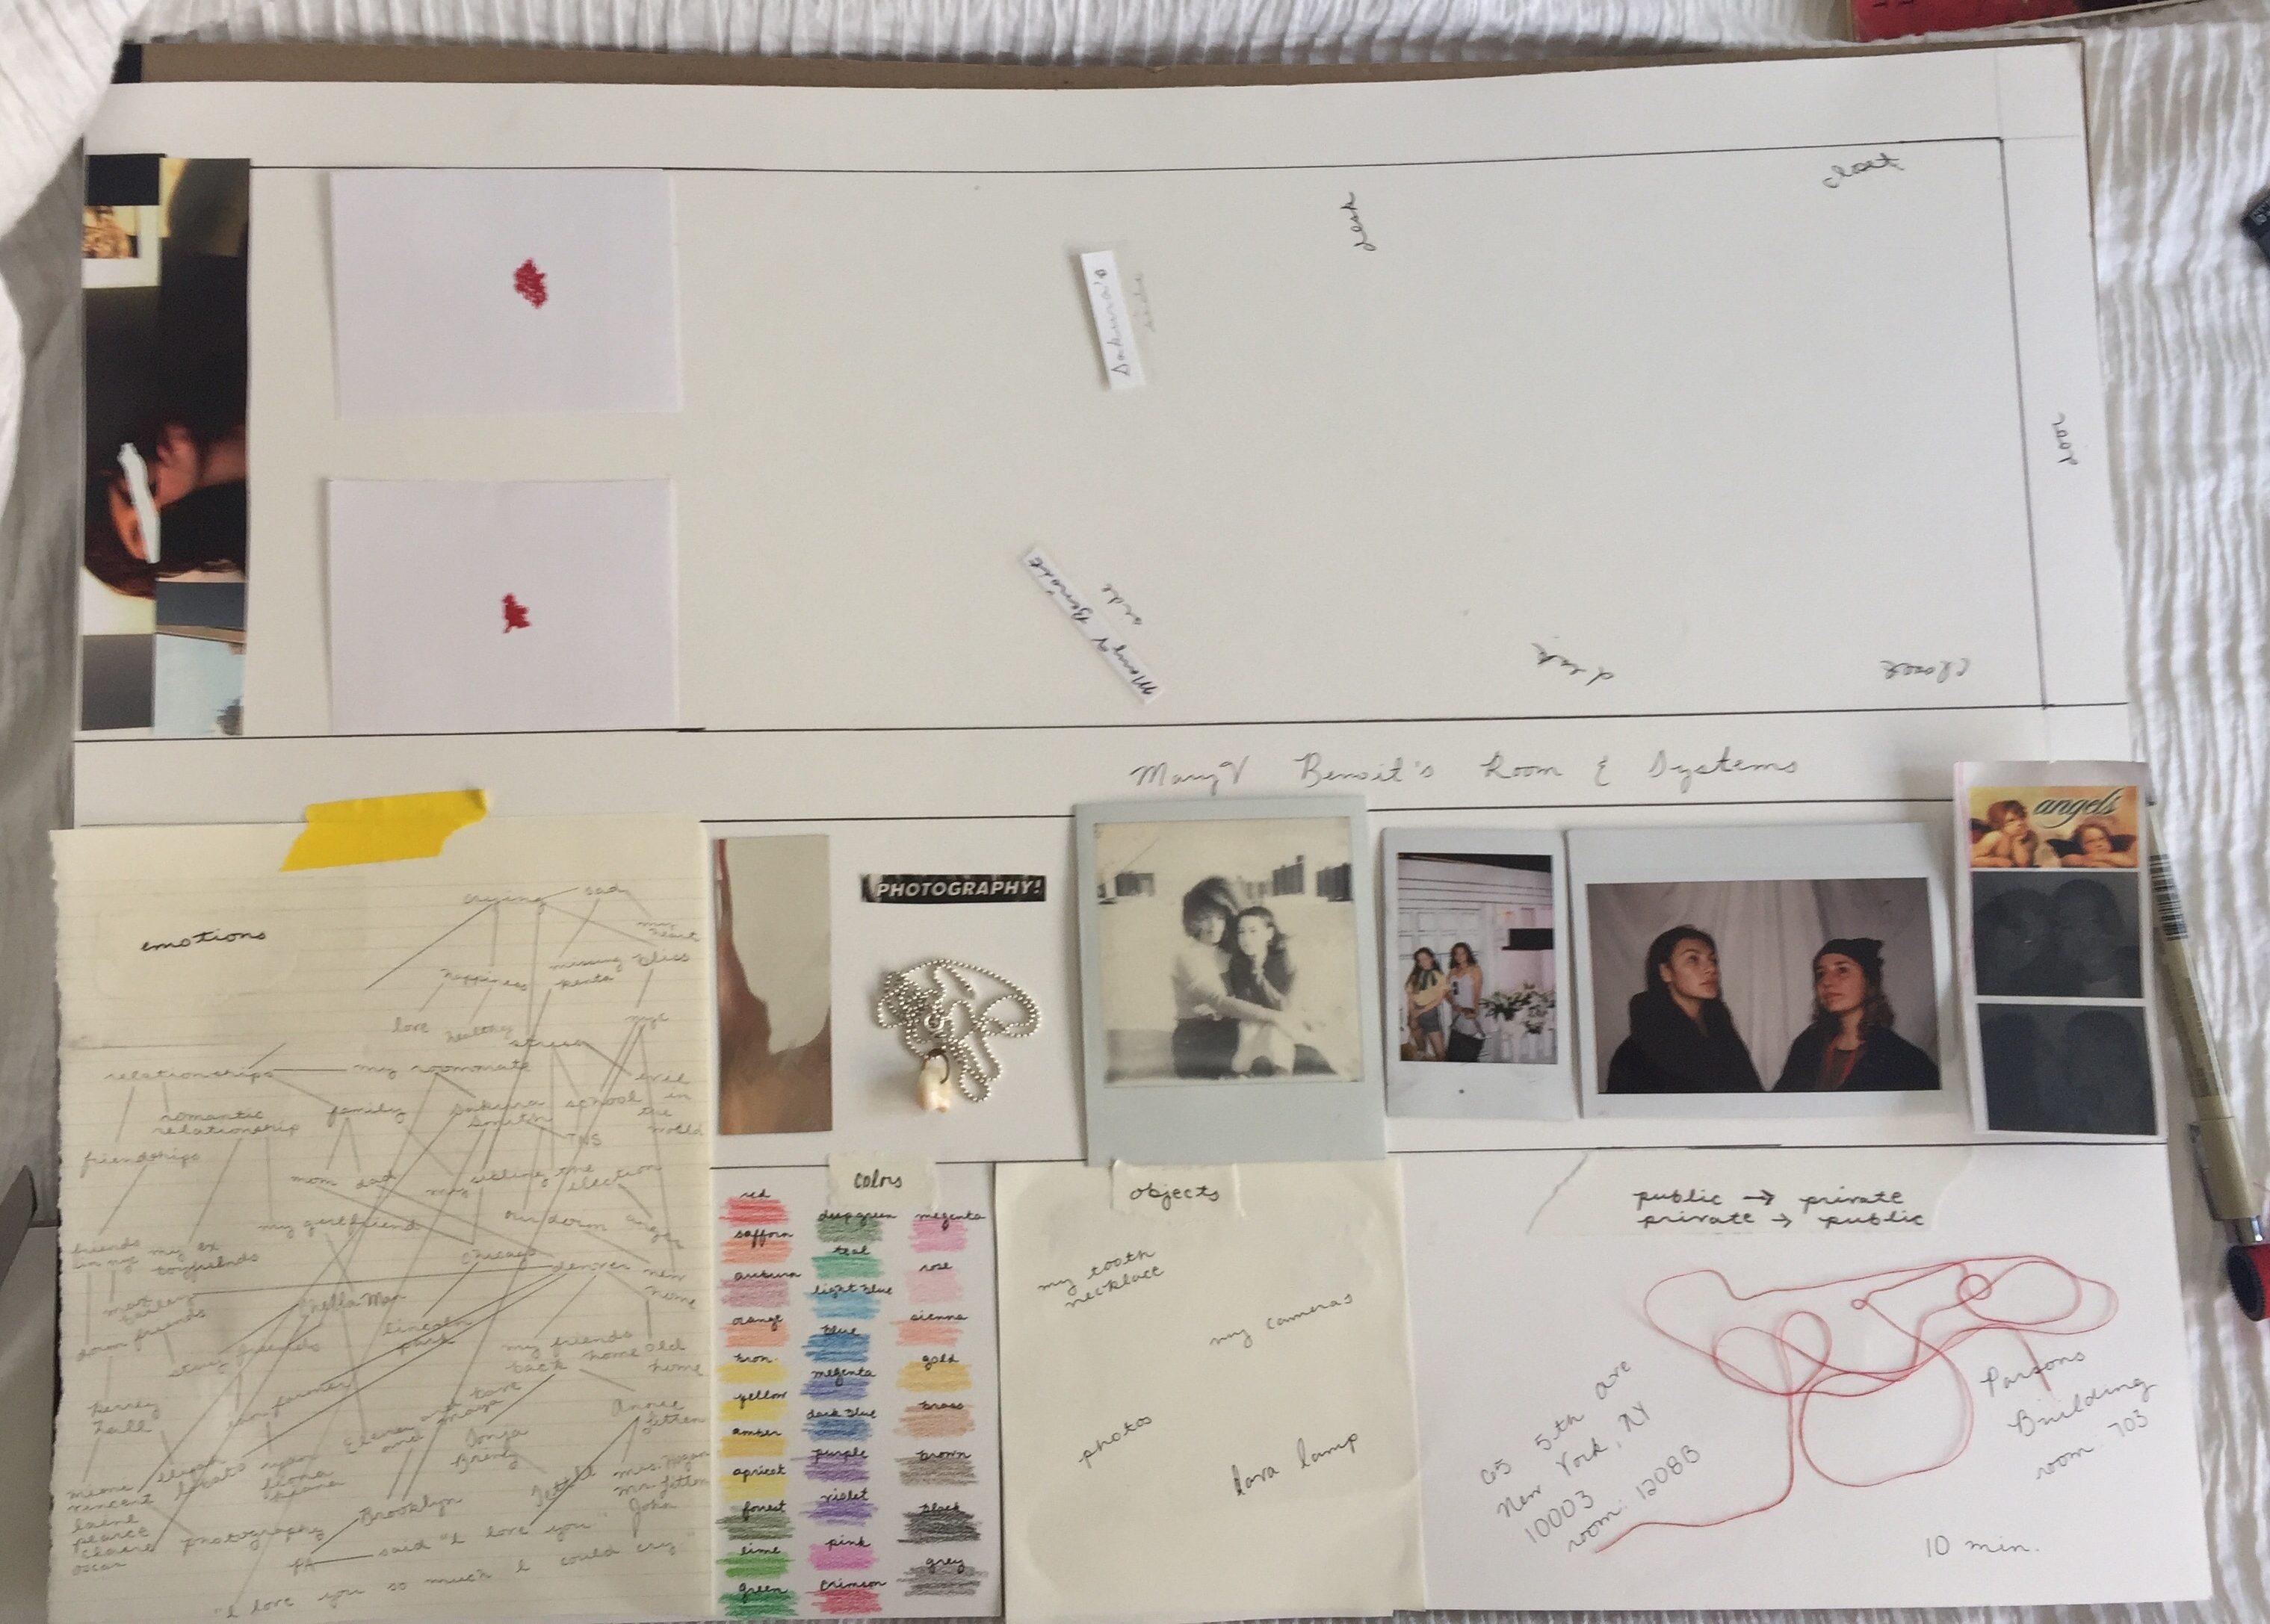 Bridge #1 Room Diagram: 5 Systems